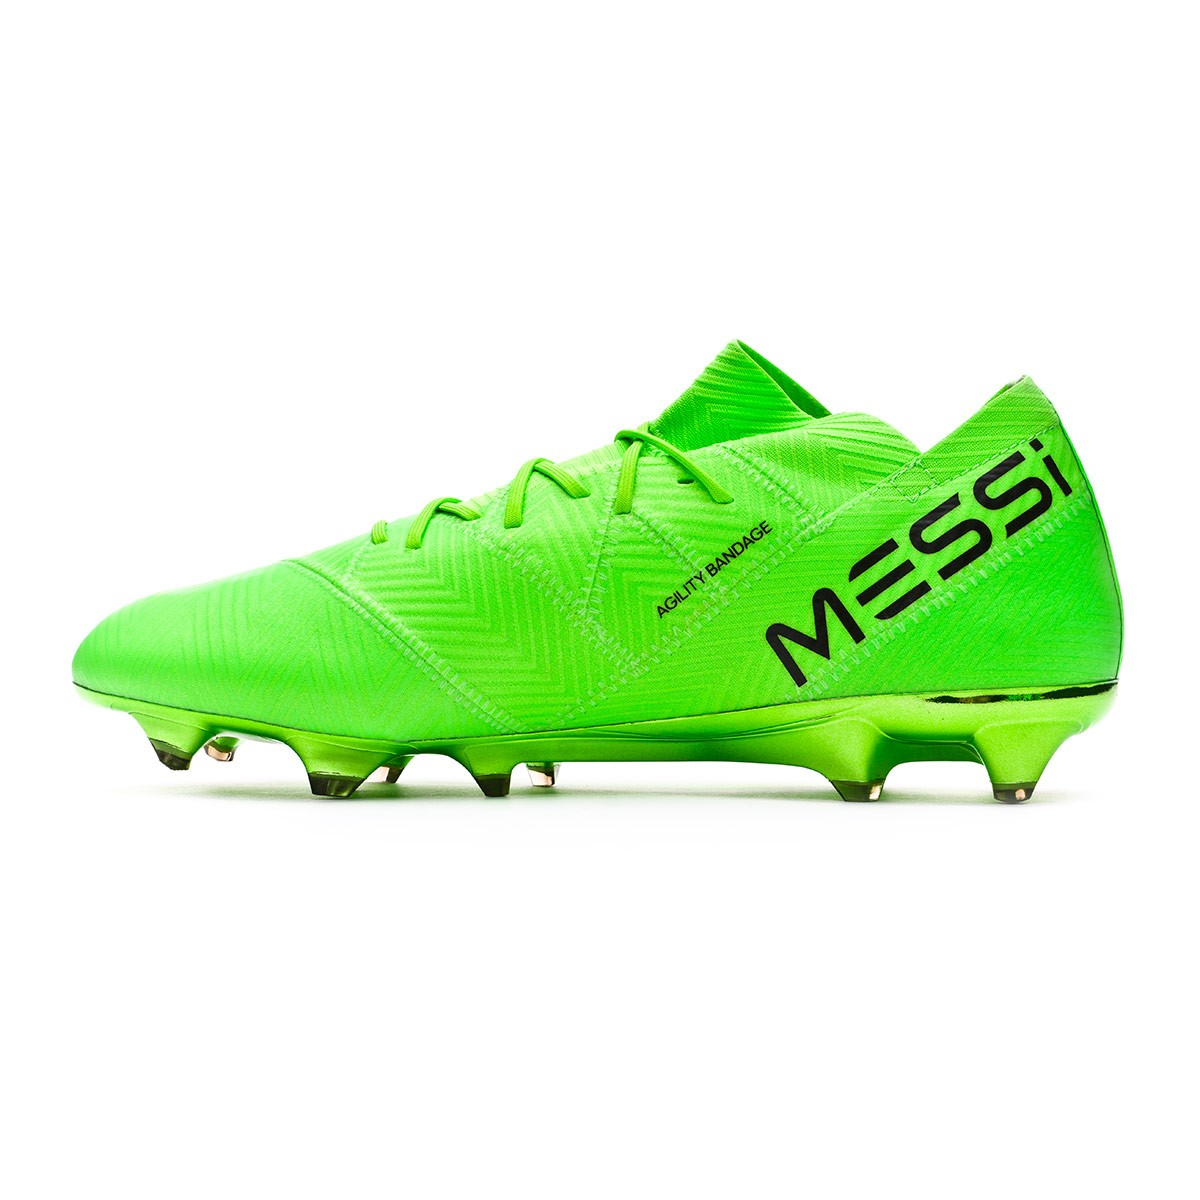 6c232debb Football Boots adidas Nemeziz Messi 18.1 FG Solar green-Black - Football  store Fútbol Emotion